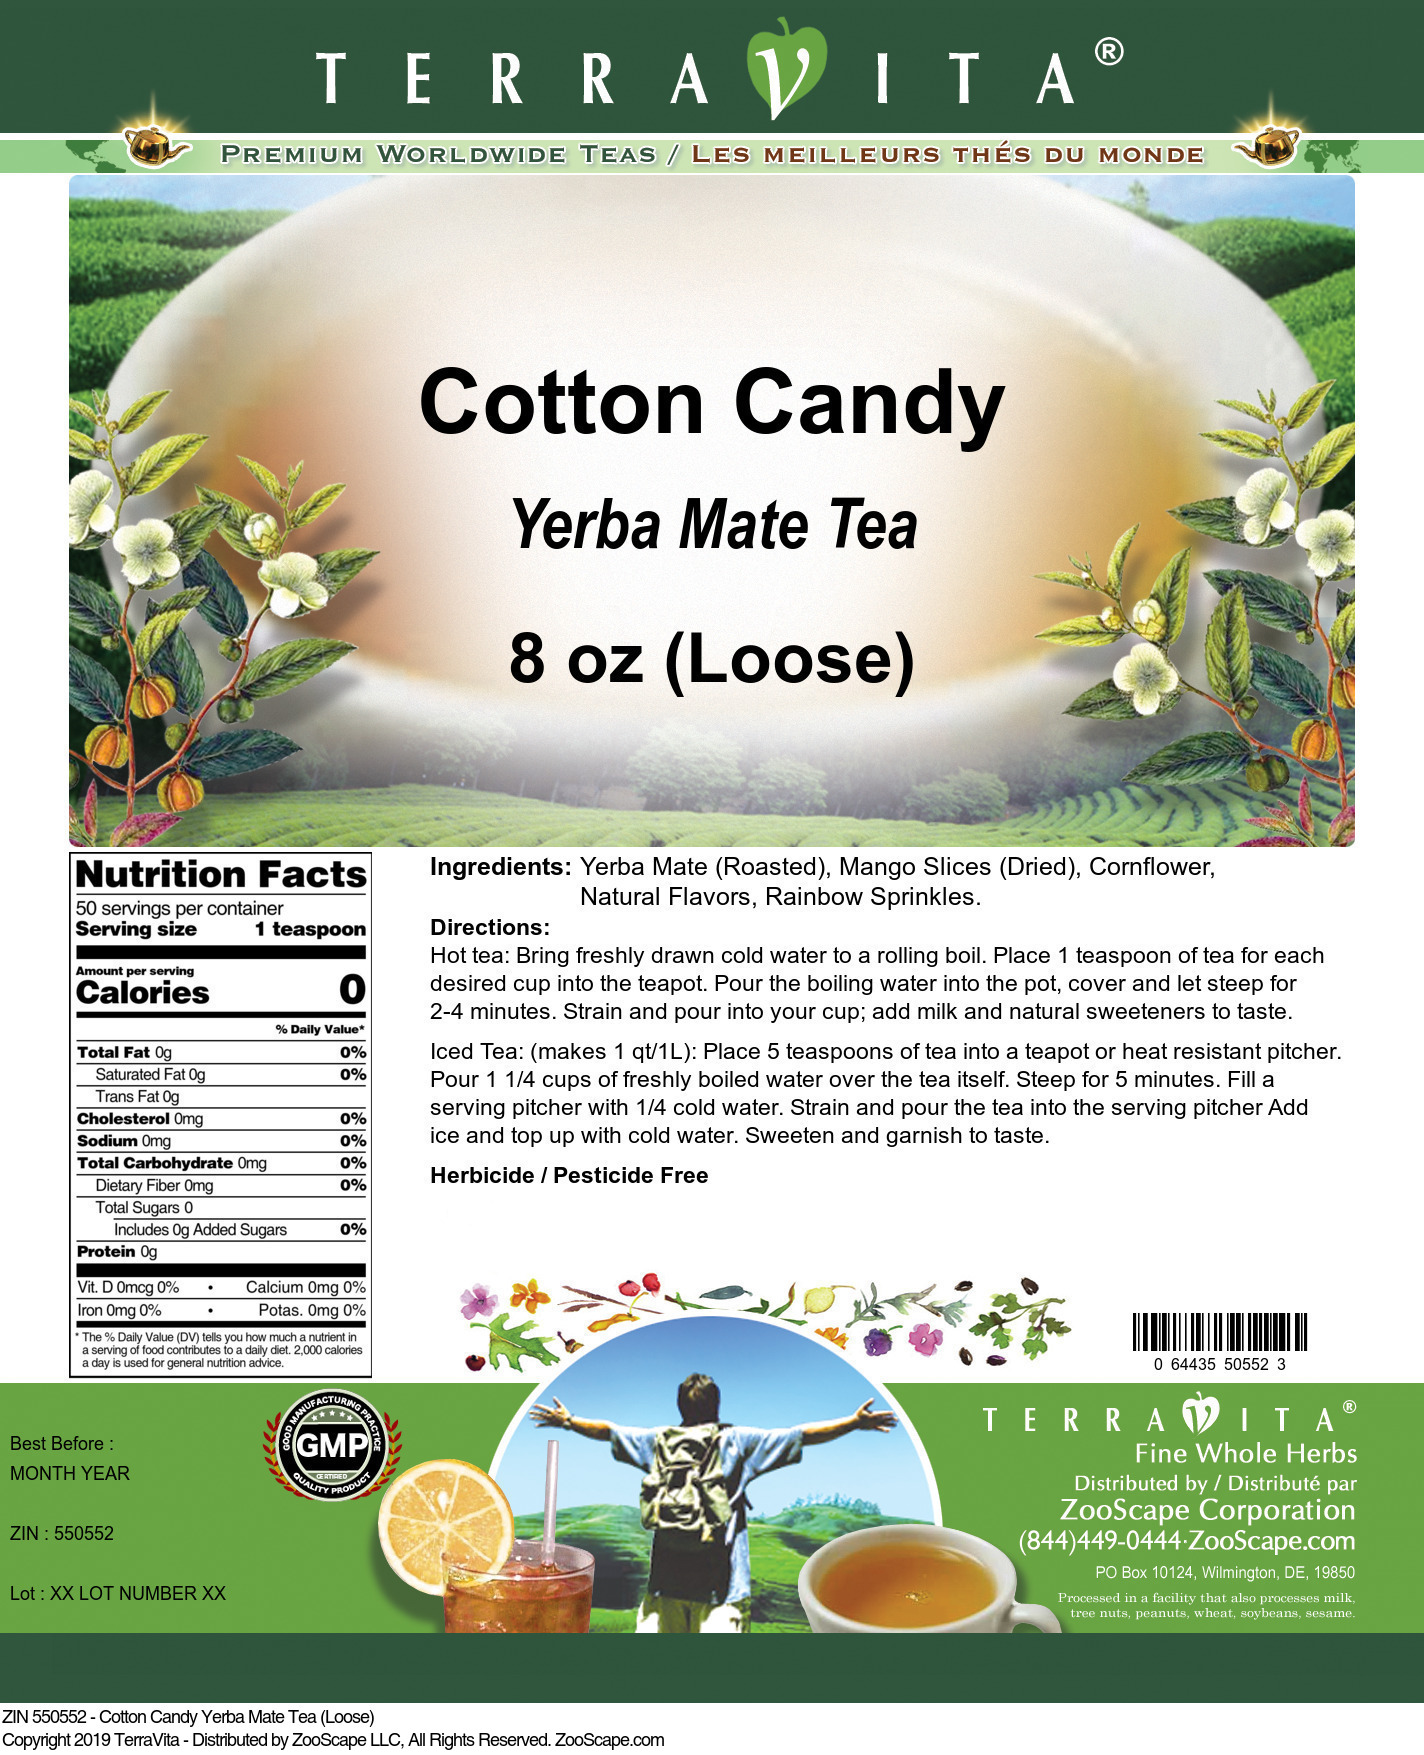 Cotton Candy Yerba Mate